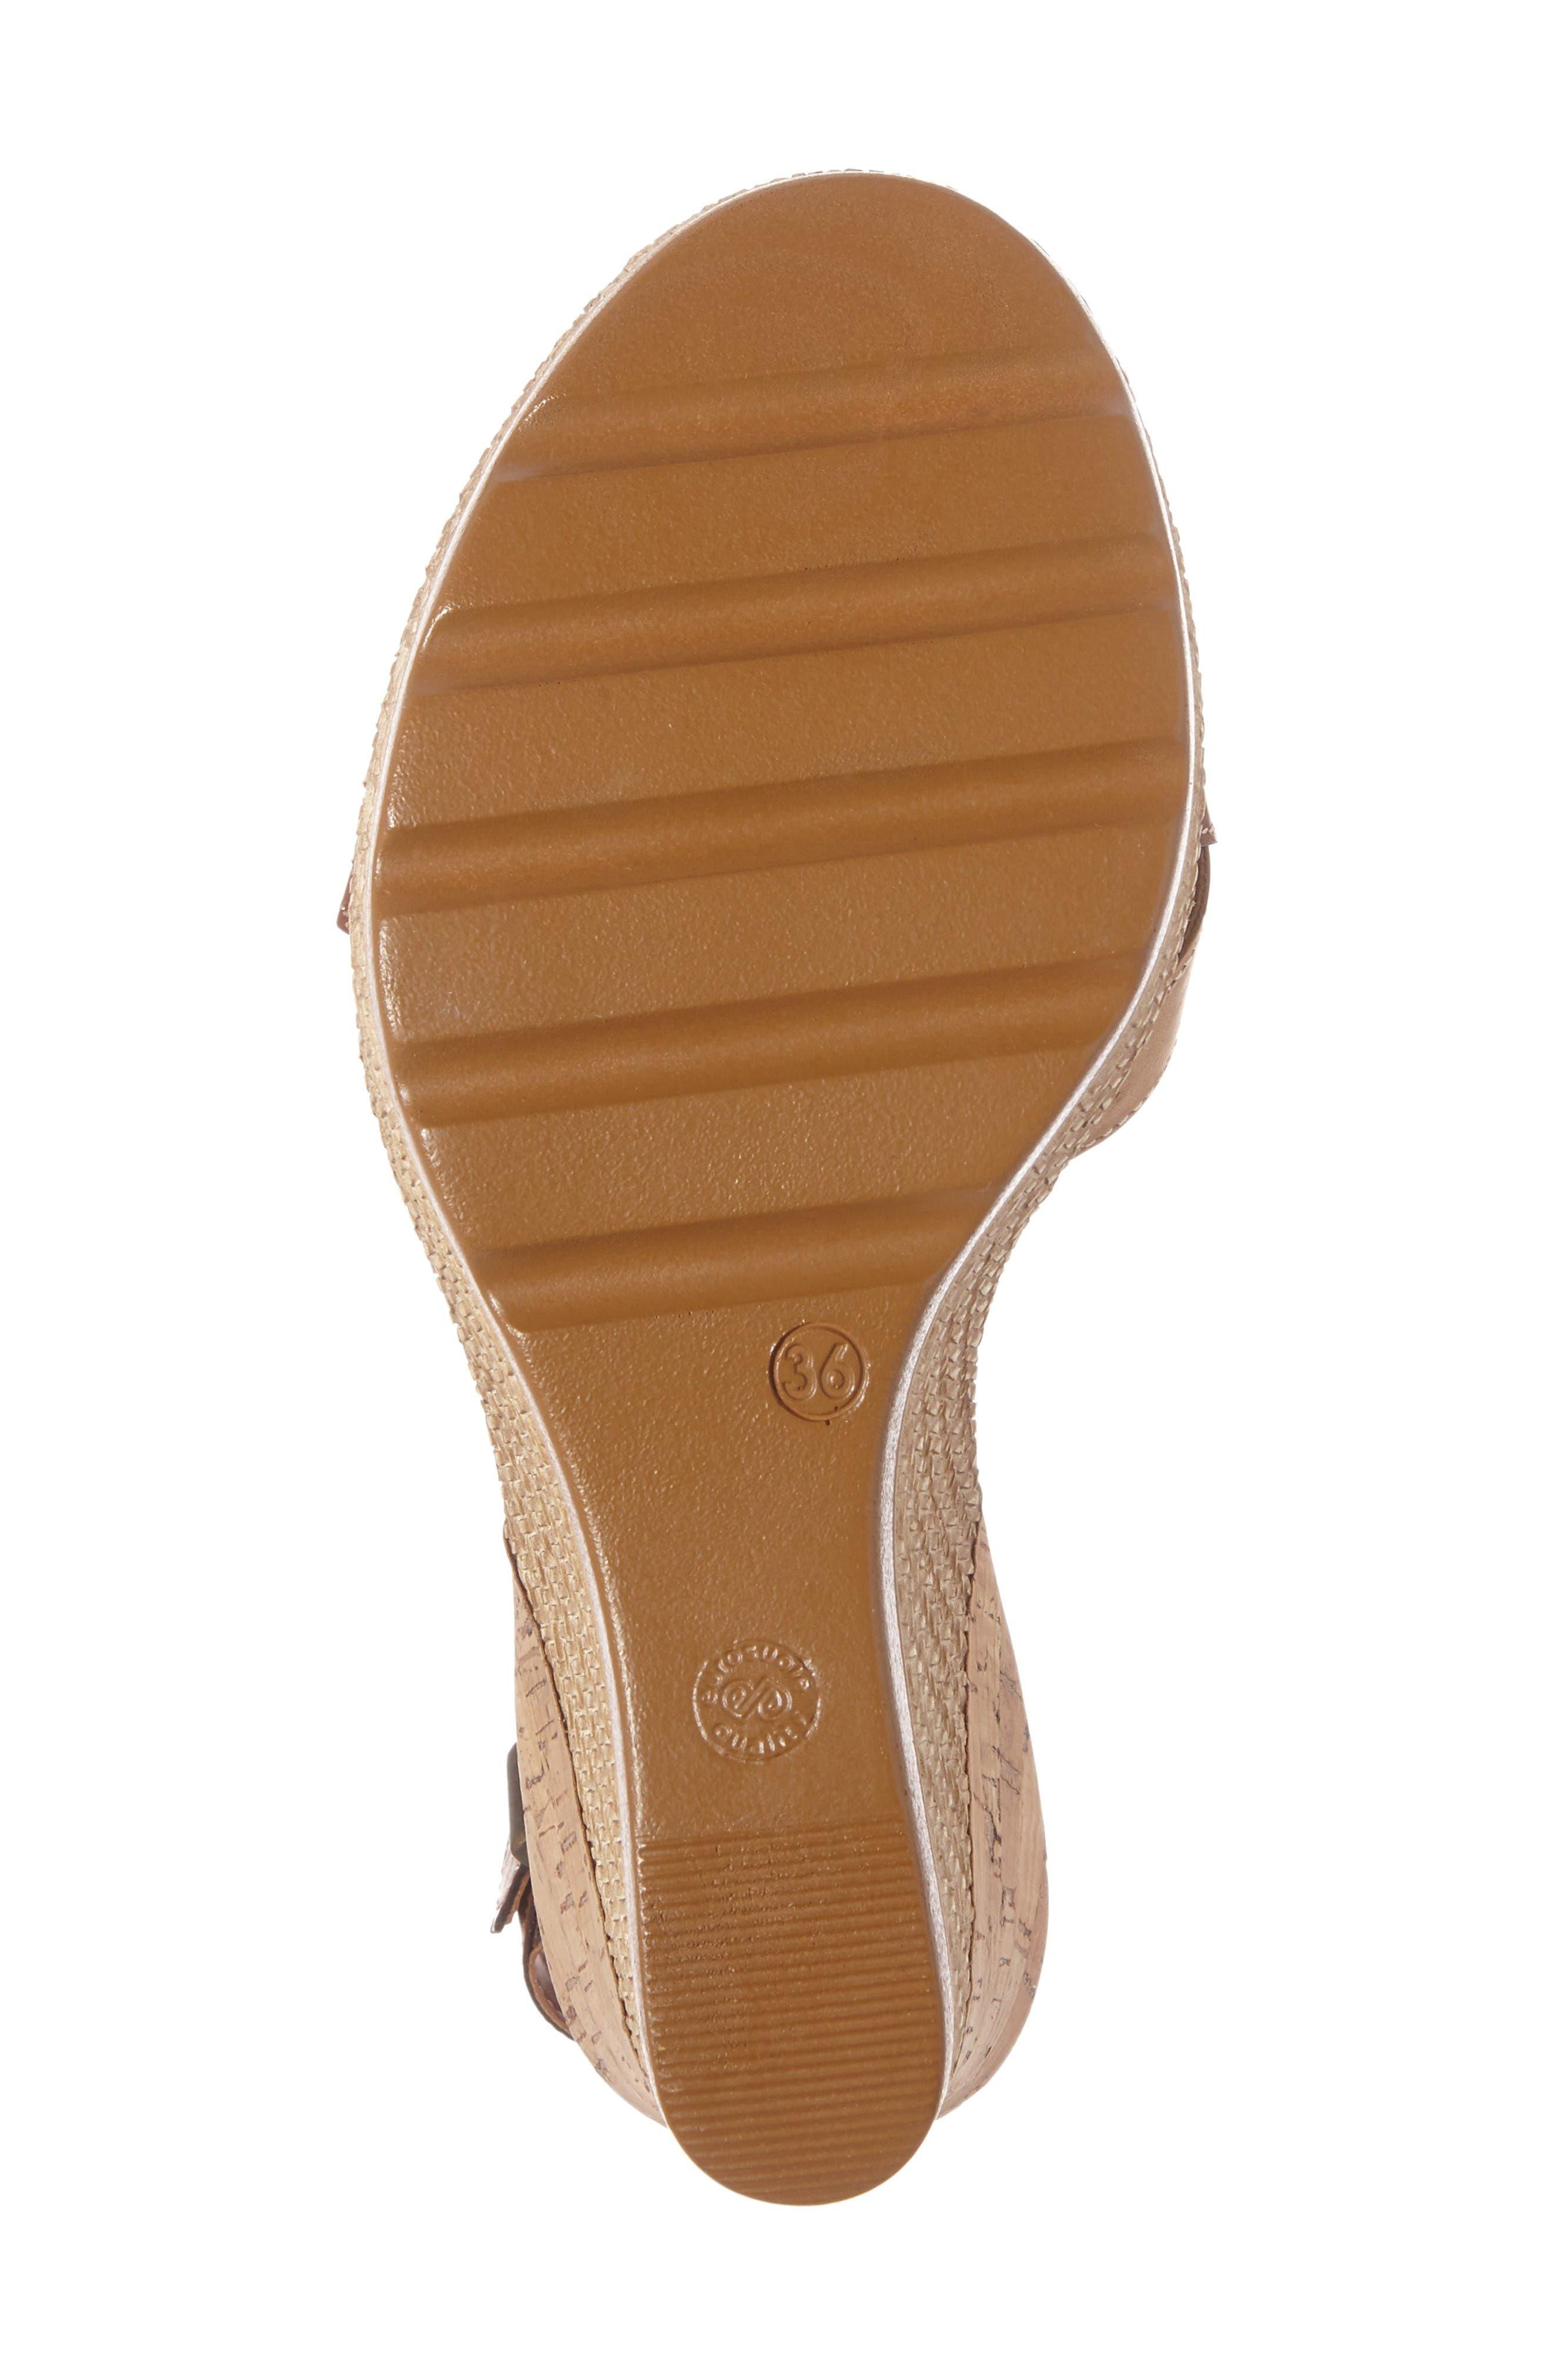 Modena Wedge Sandal,                             Alternate thumbnail 4, color,                             Cognac Leather